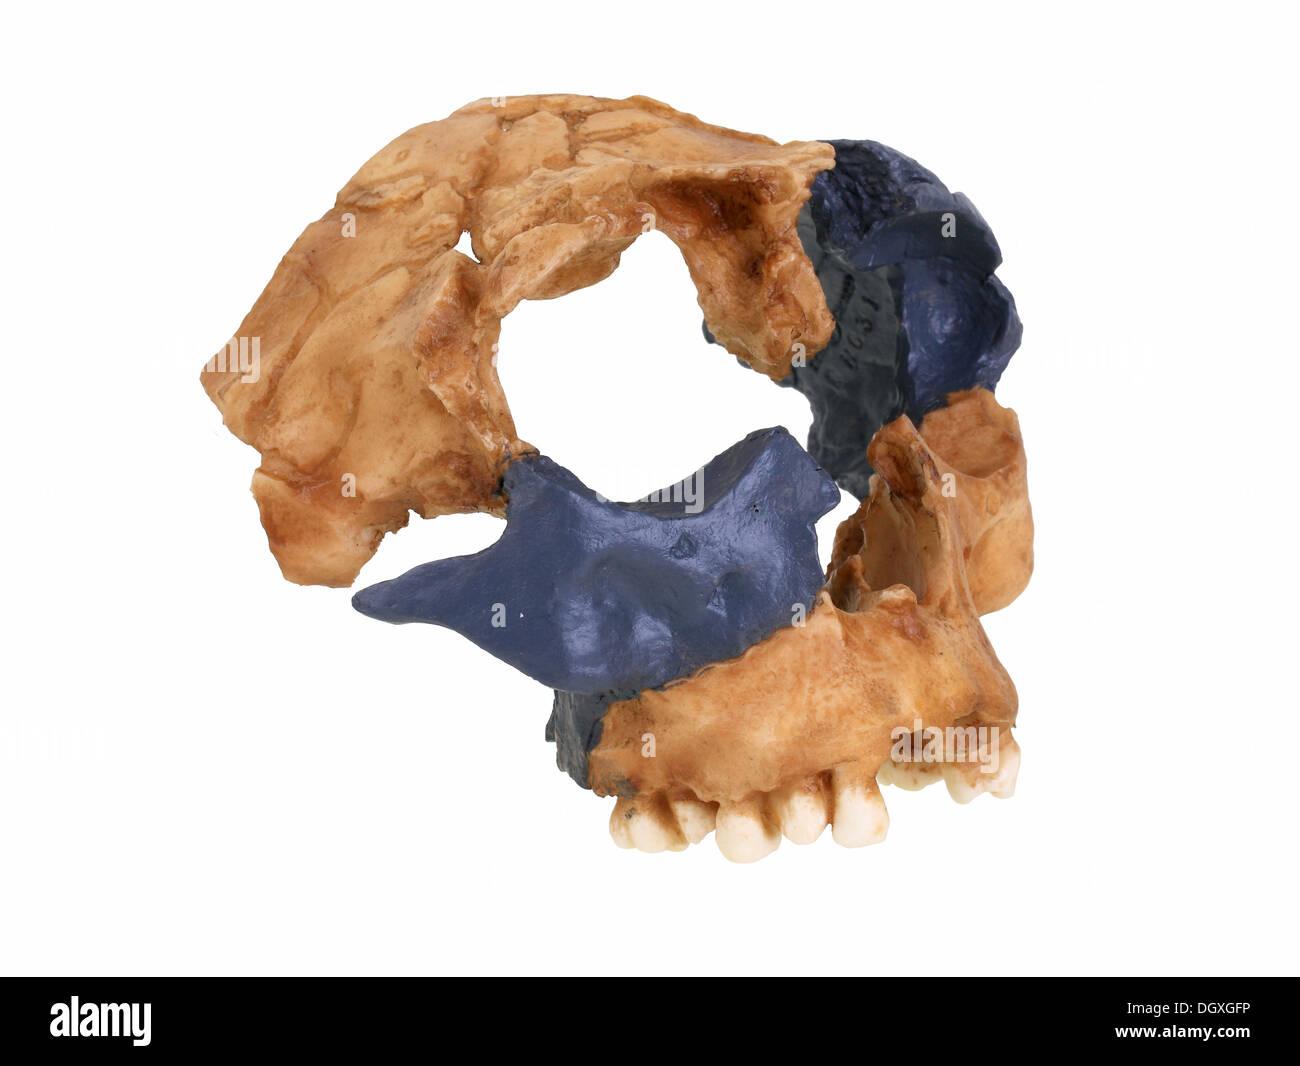 Replica skull of Homo antecessor, evolution of human species - Stock Image